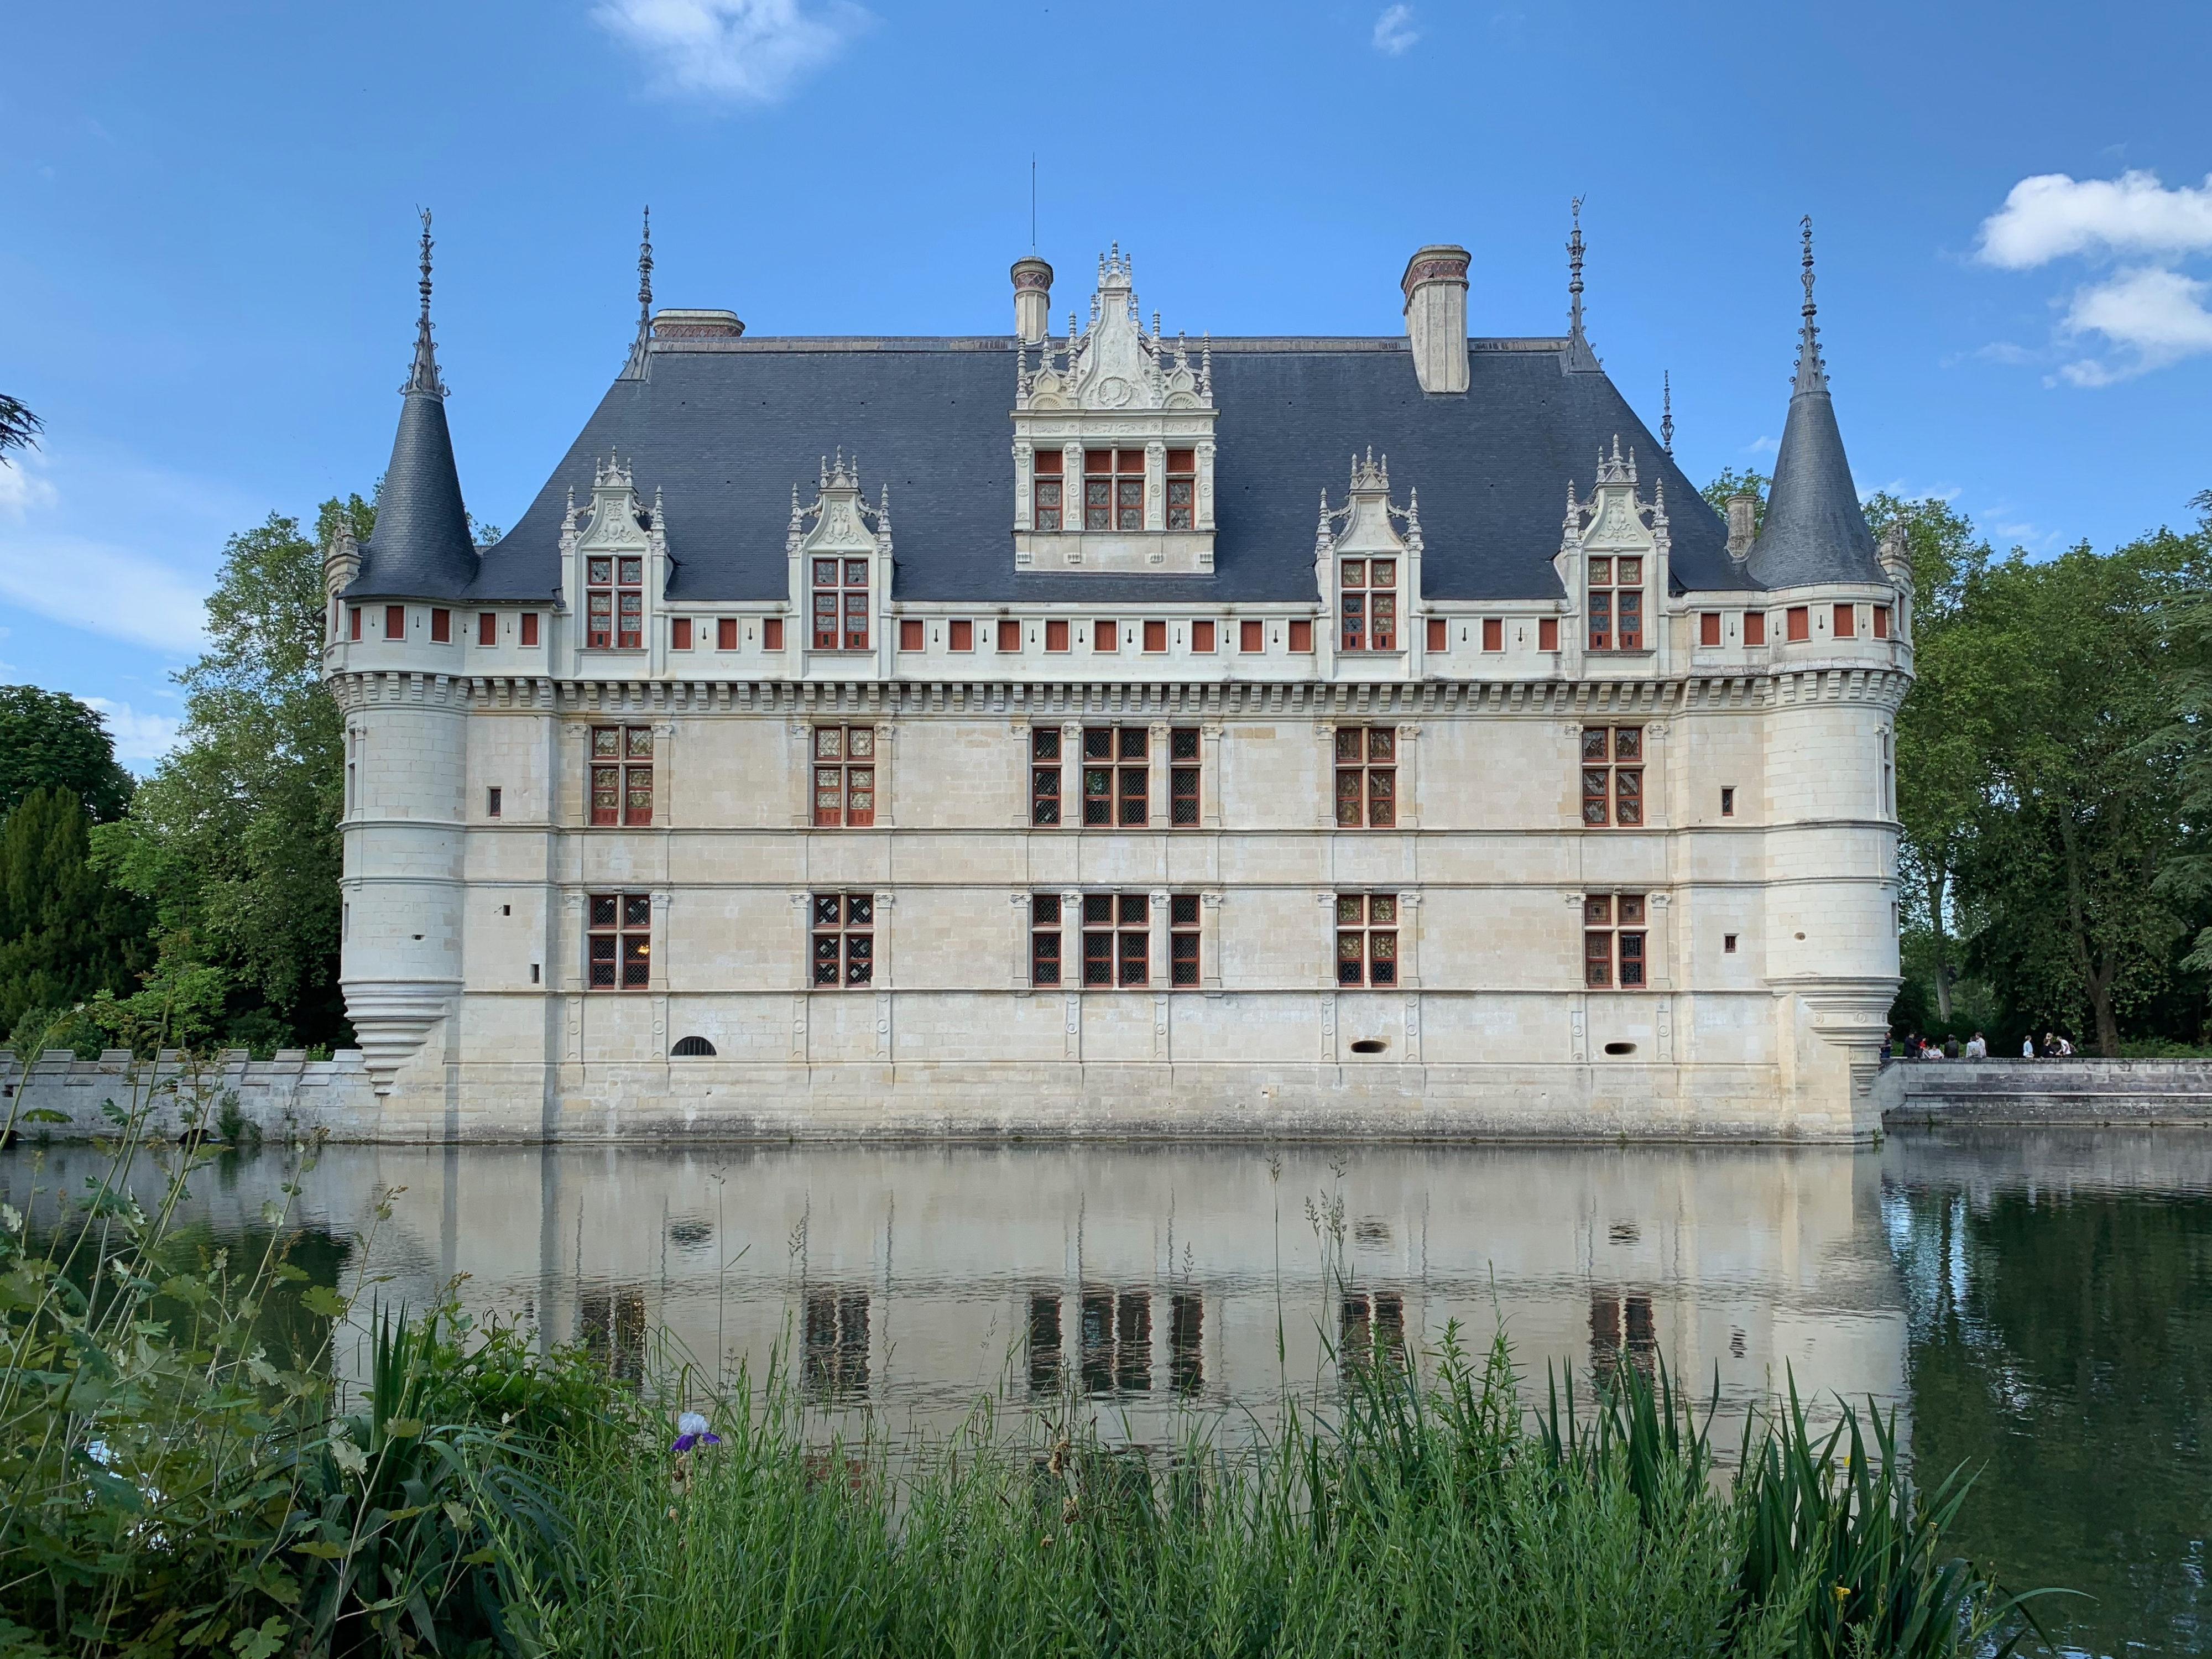 Azay-le-Rideau, das vom Indre umflossene Renaissance-Schloss laut Balzac ein Diamant